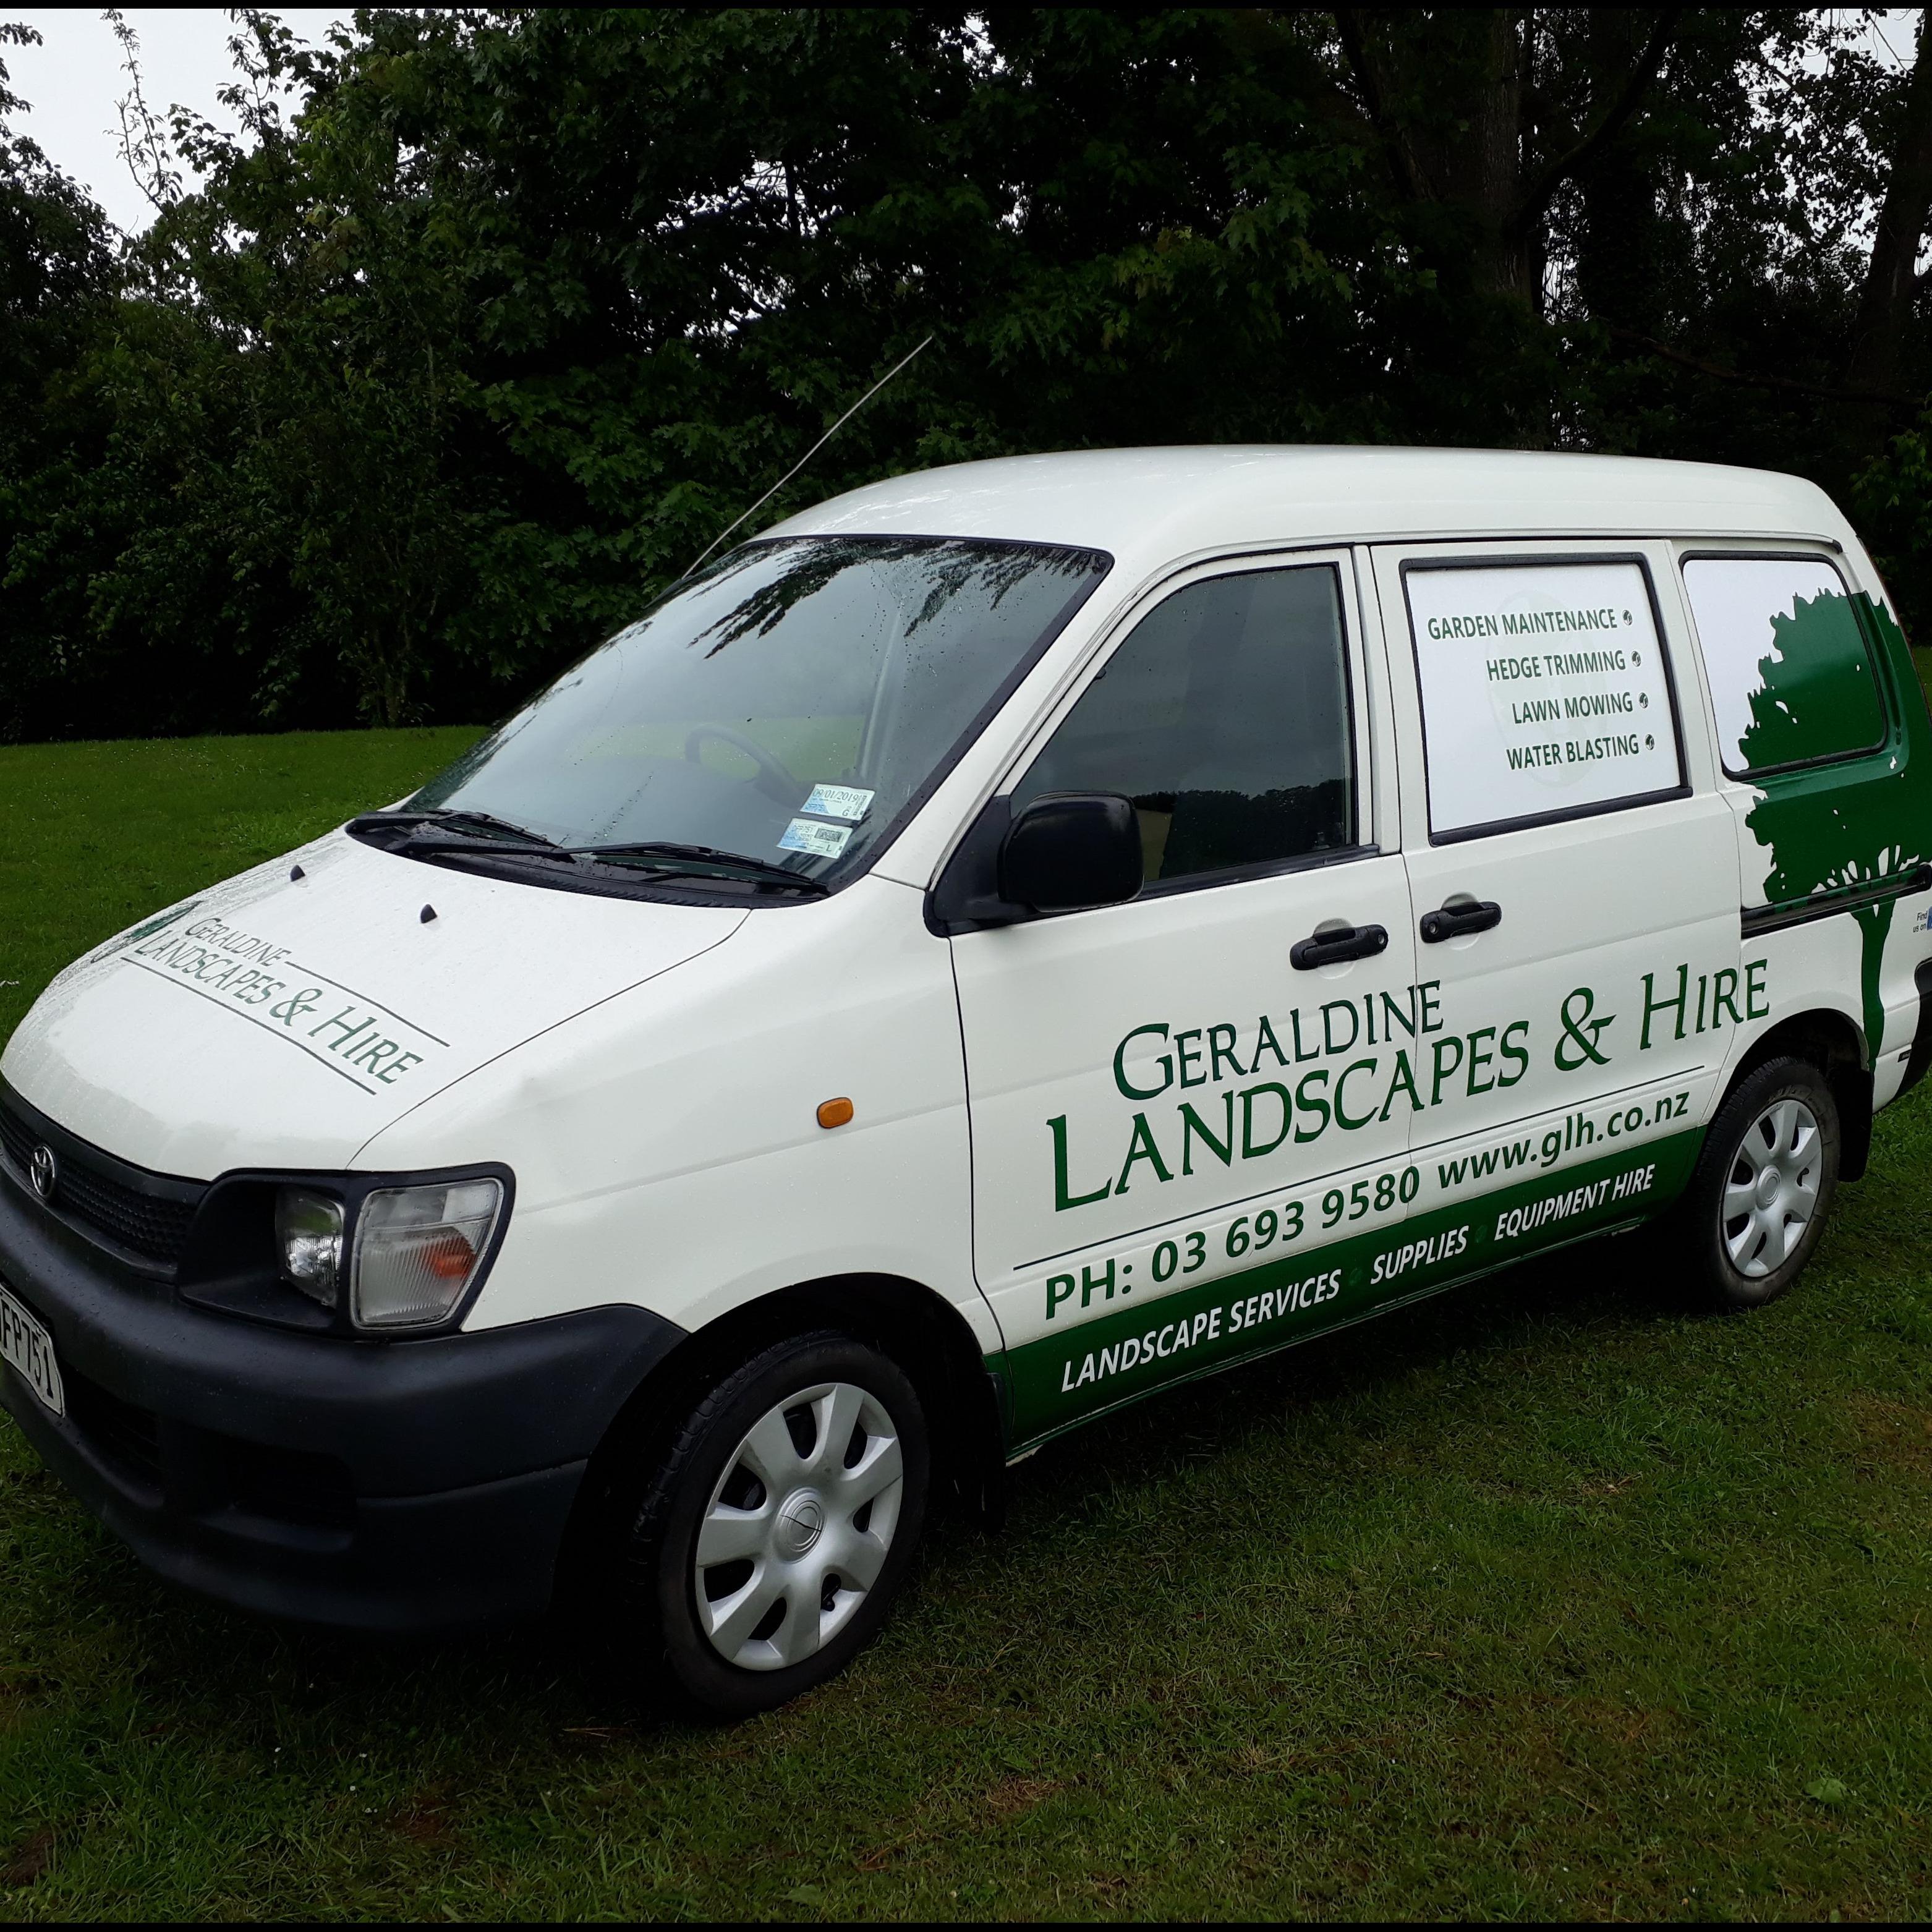 Geraldine Landscapes & Hire Limited